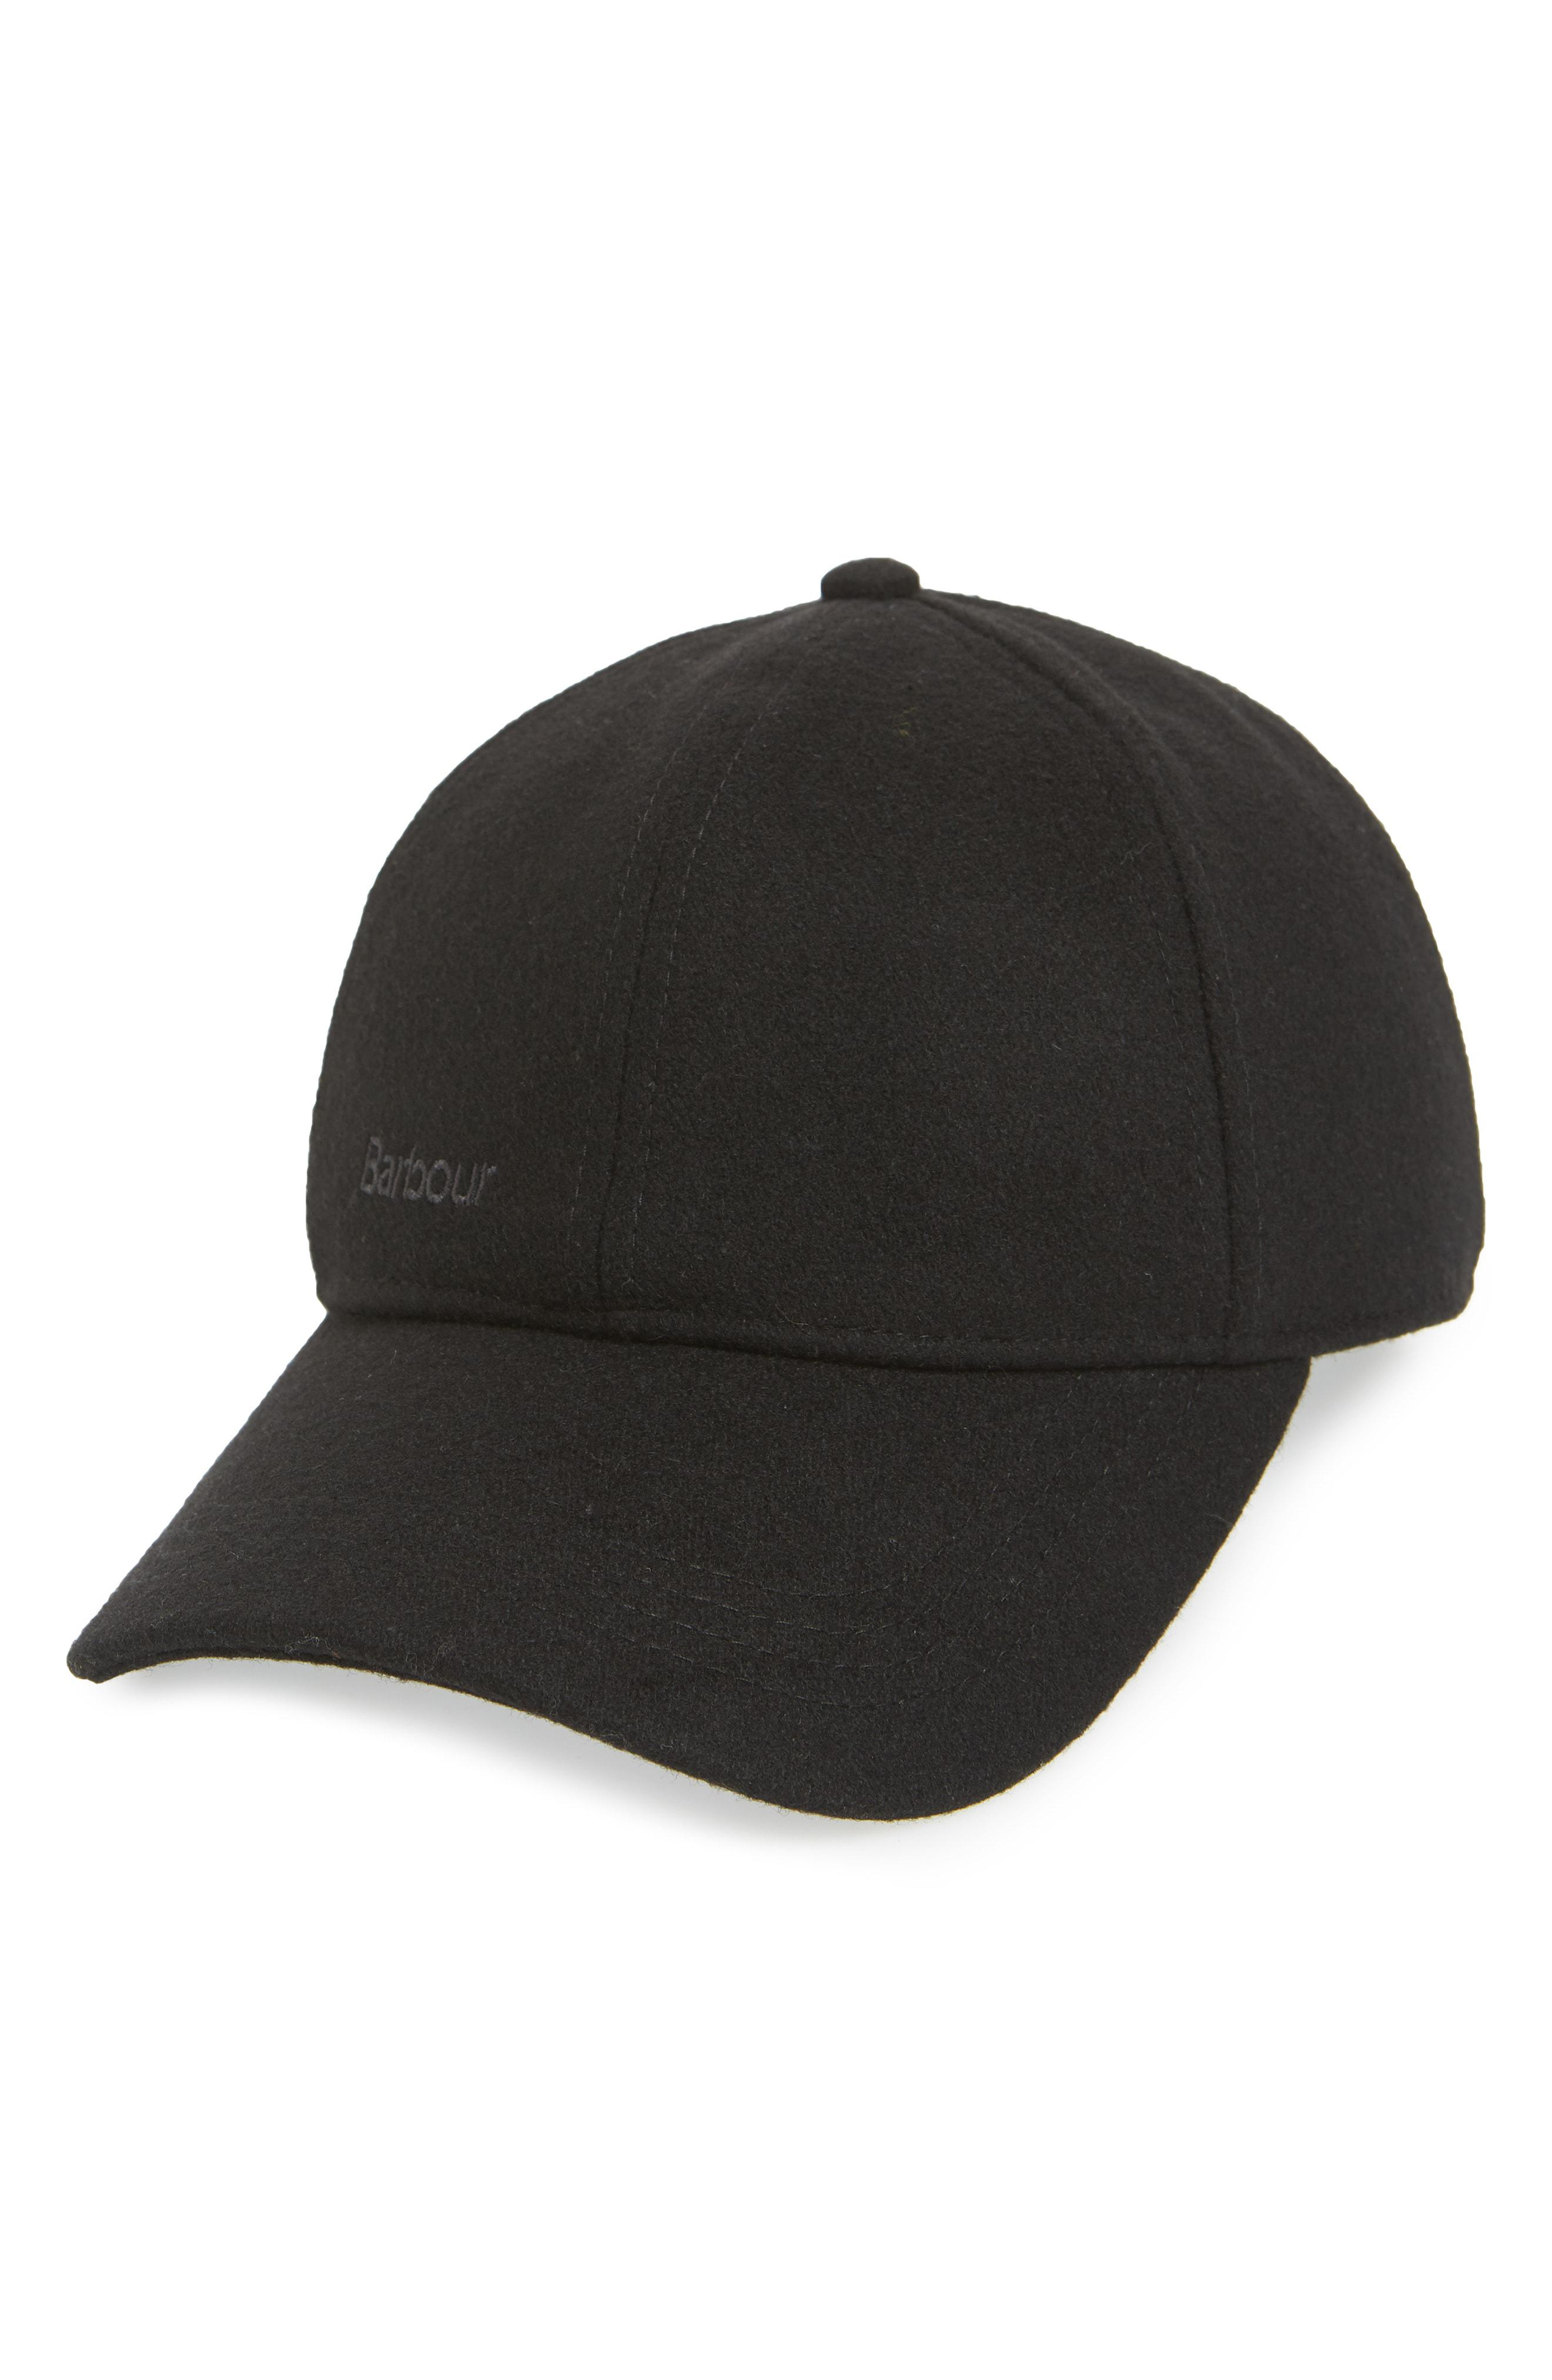 f72f2d92c40 Lyst - Barbour Coopworth Wool Blend Baseball Cap in Black for Men